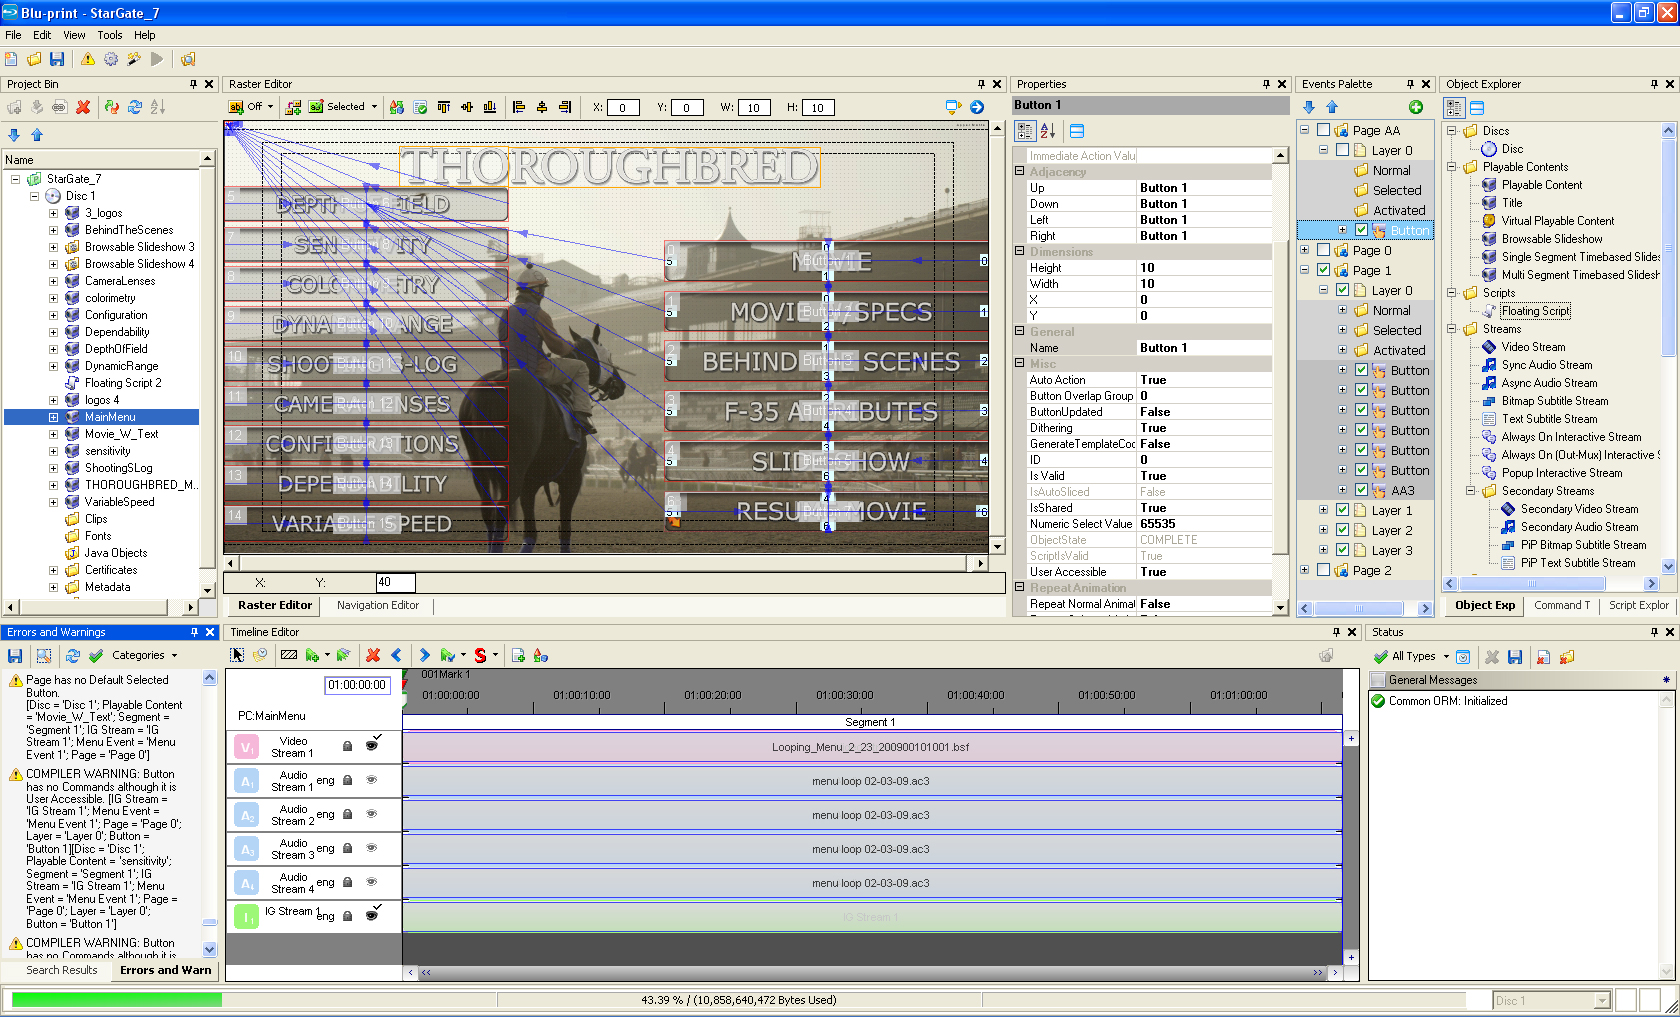 Sony blu print 2d3d blu ray disc authoring system blu print navigation editor blu print raster editor 1 malvernweather Image collections